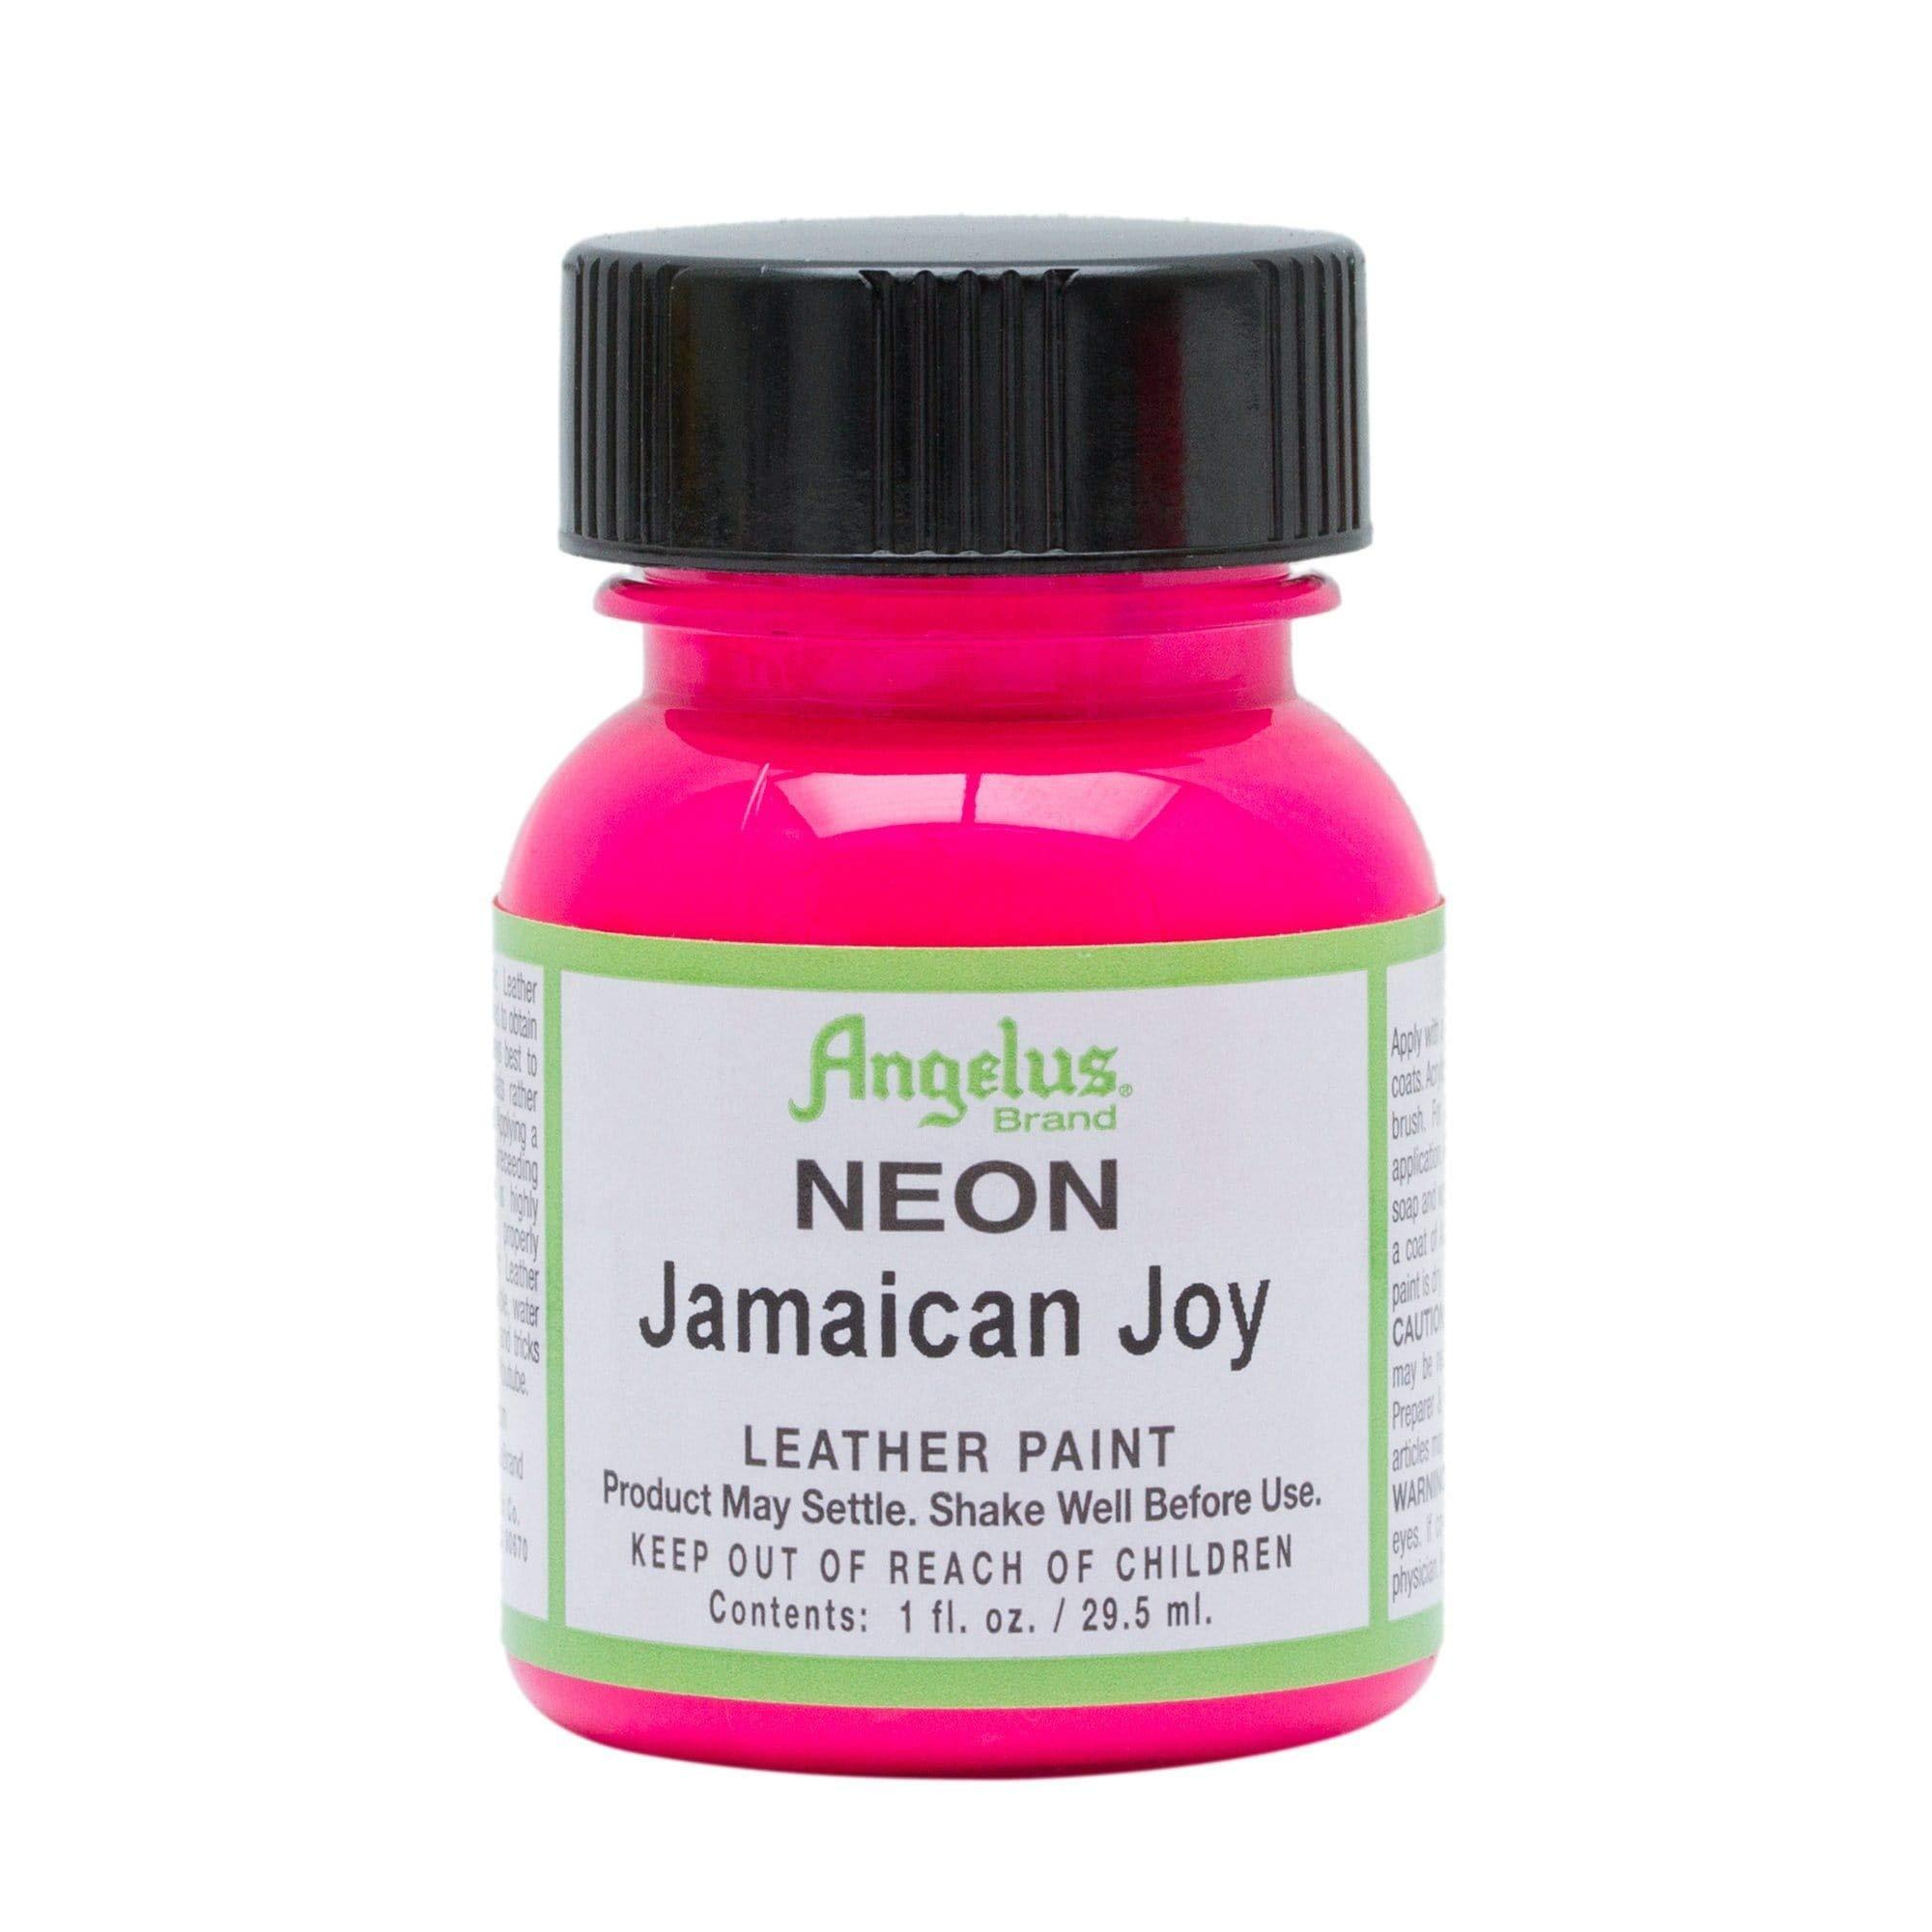 Angelus Leather Paint 1 oz Neon Jamaican Joy